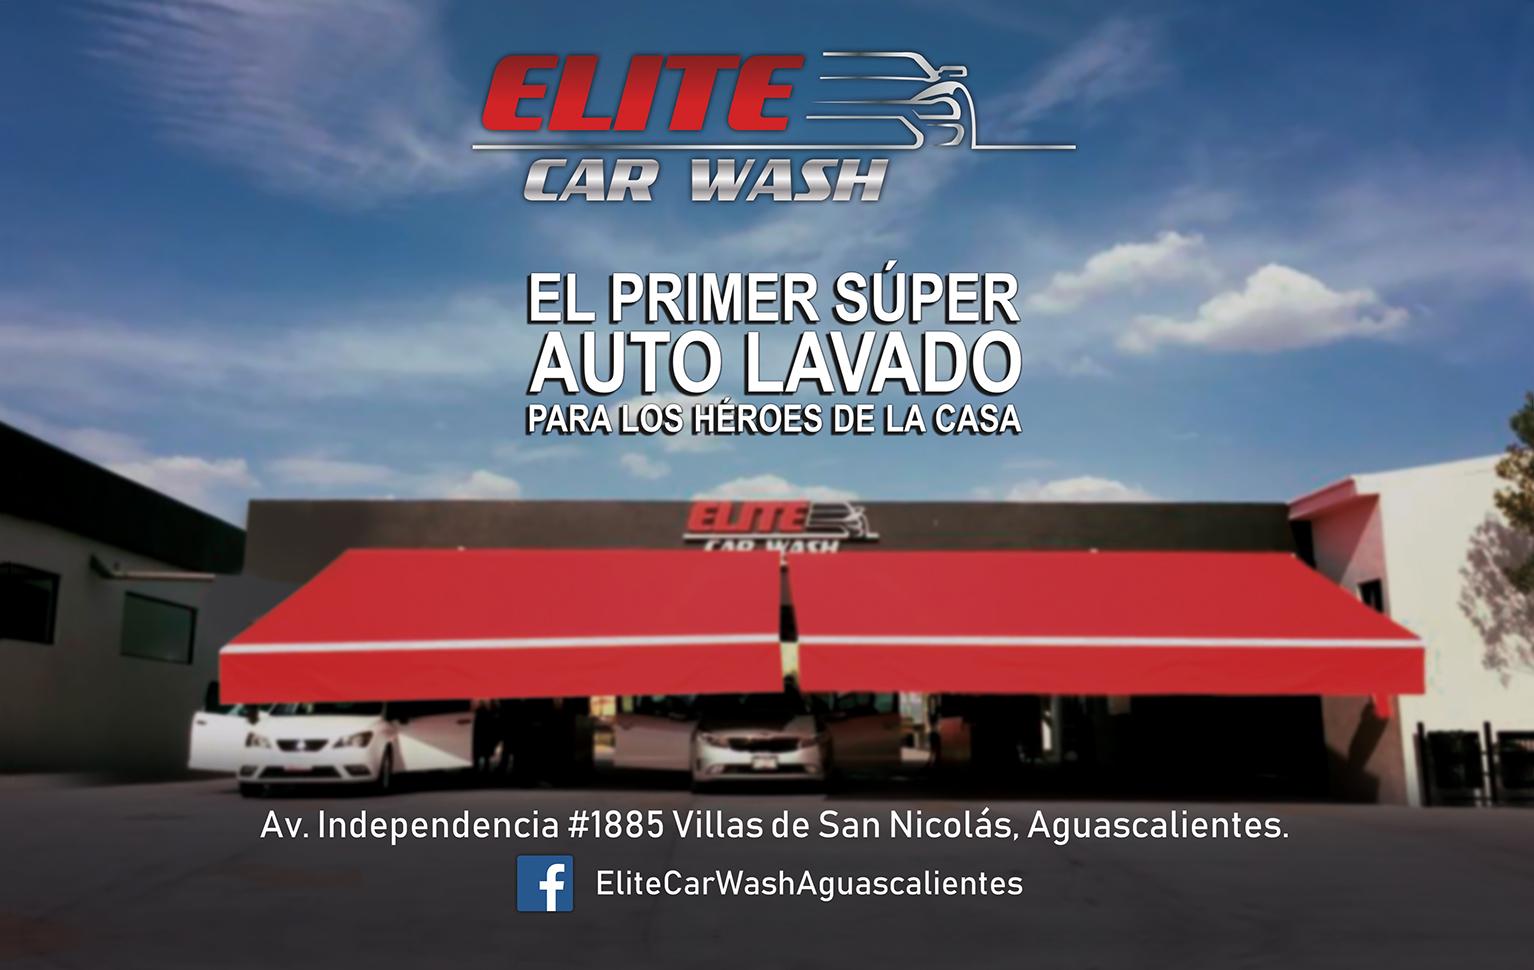 ELITE CAR WASH